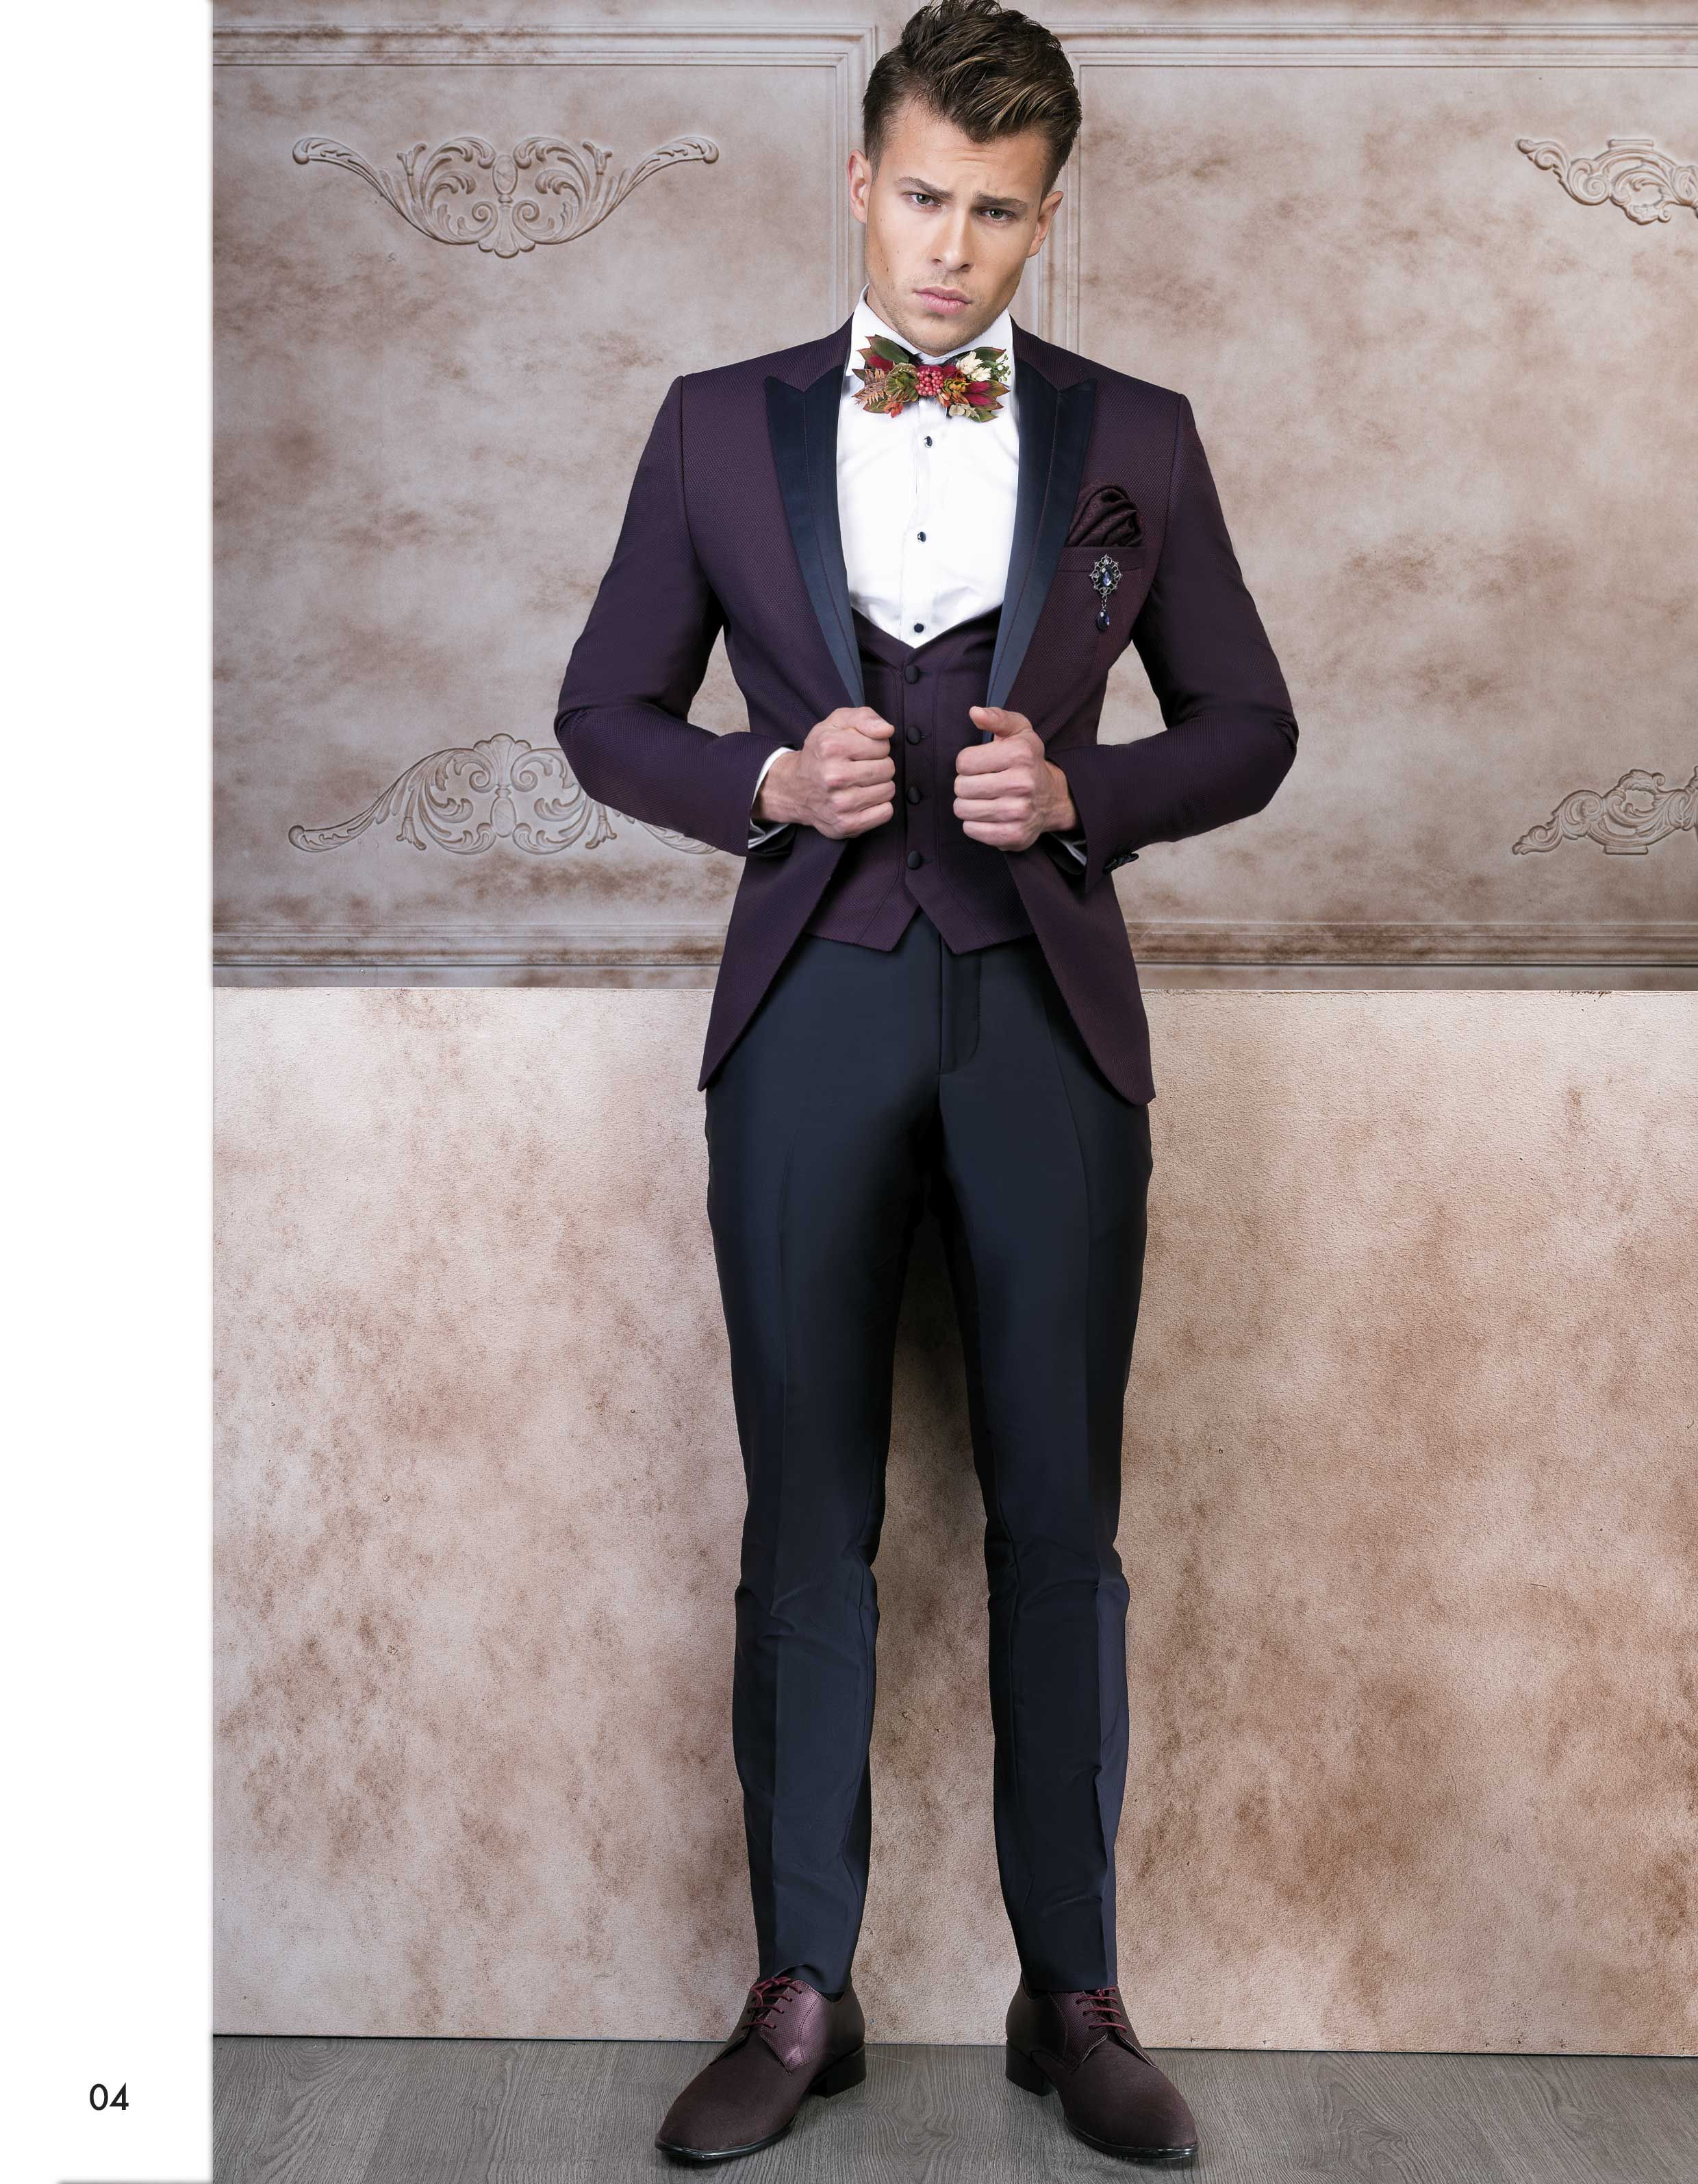 e68a96f641f1d Tuxedo & Wedding Suits Models of Dormen   DORMEN DAMATLIK - WEDDING ...